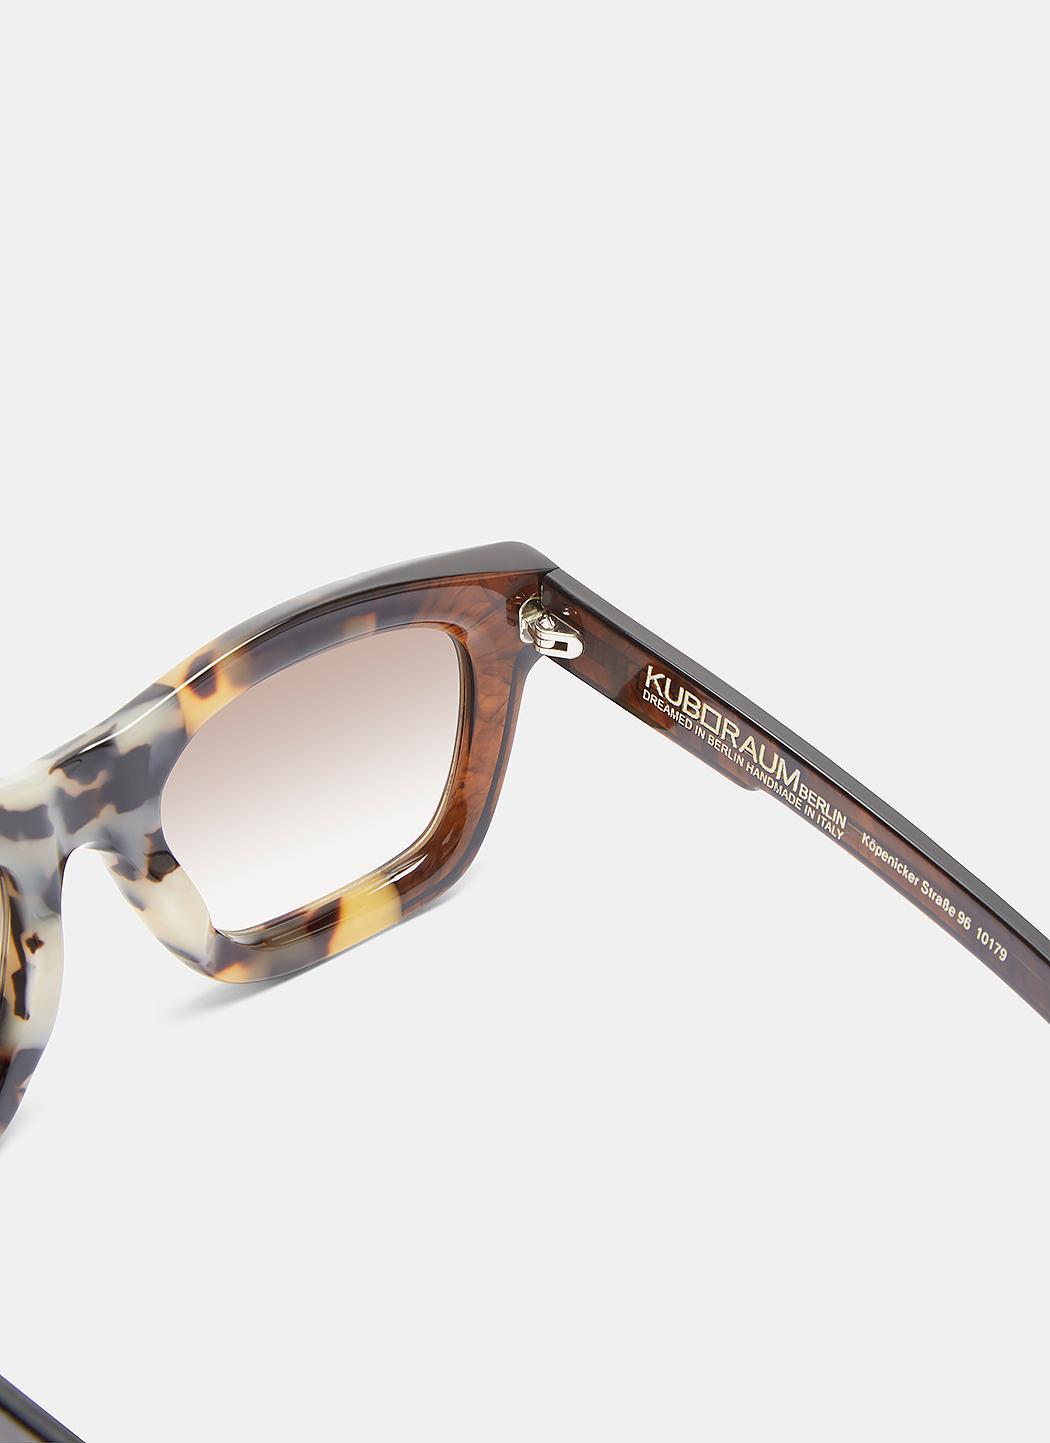 Kuboraum Mask C2 Tortoiseshell Squared Sunglasses In Brown for Men